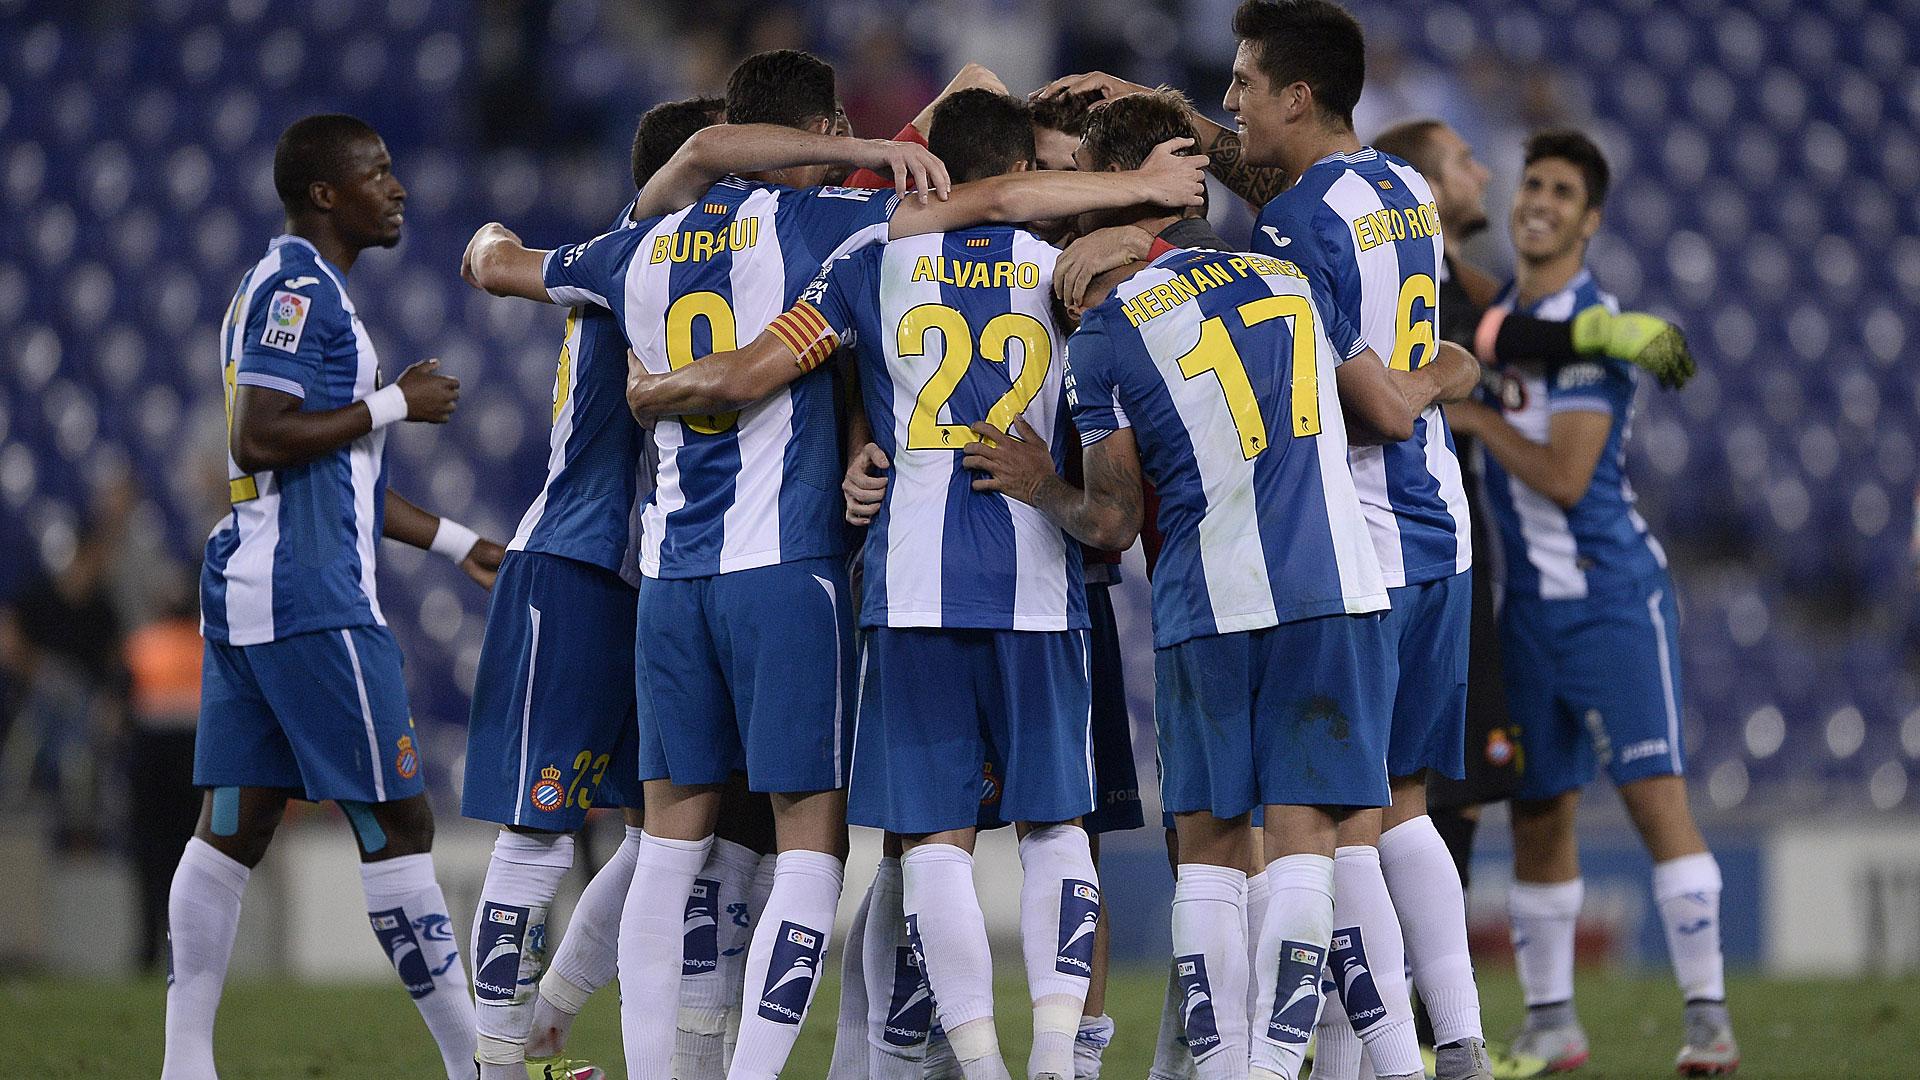 Video: Espanyol vs Levante